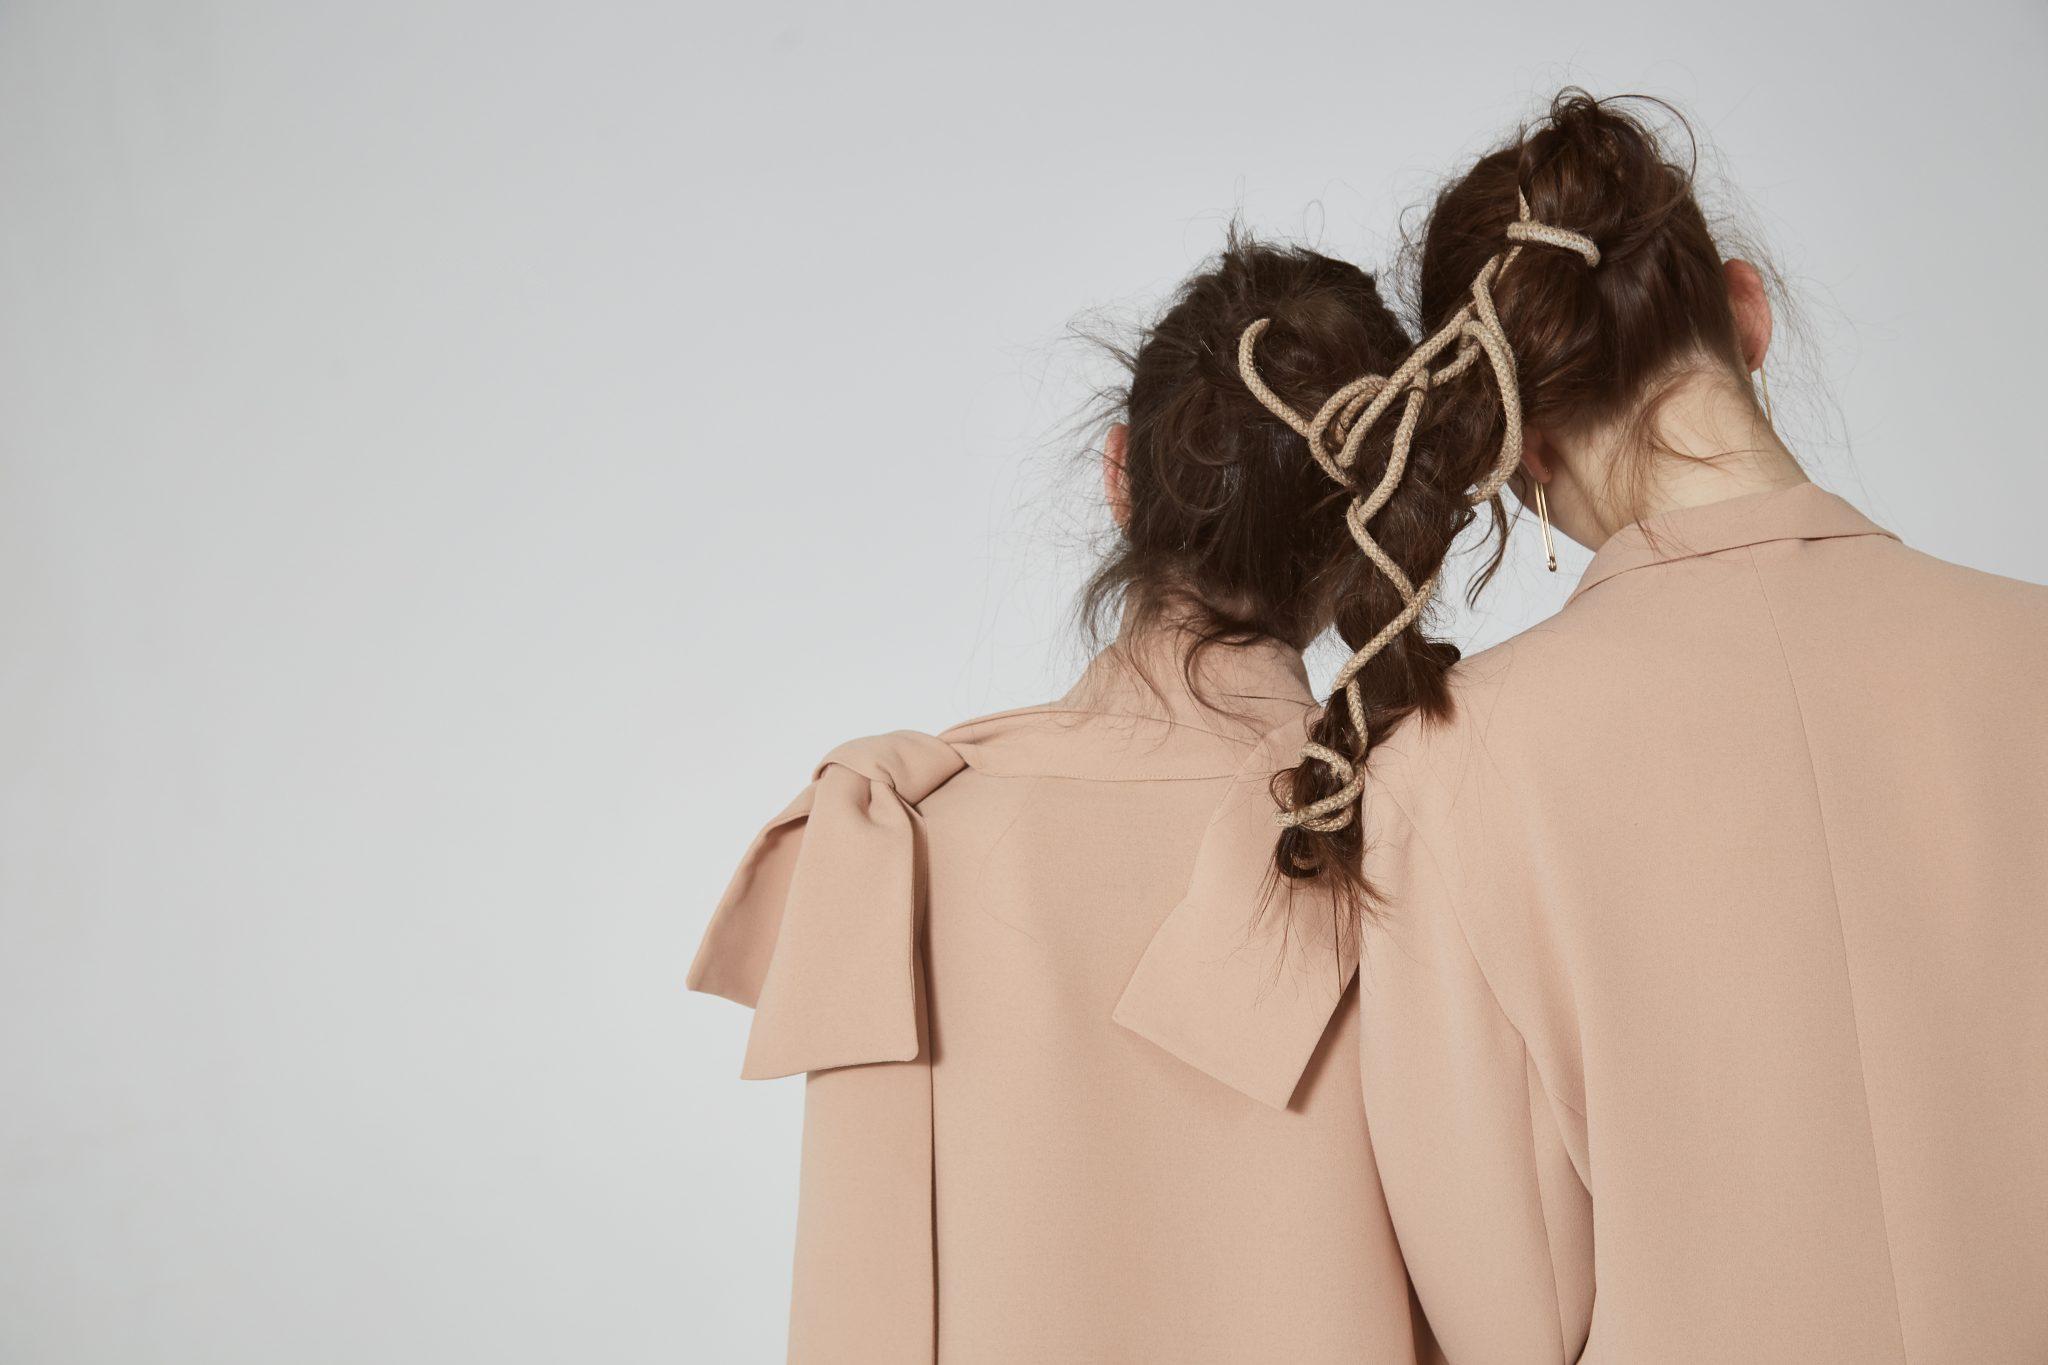 Twinning - Jungle - Editorial - Marcin Leszczyński - Sarah Stalder